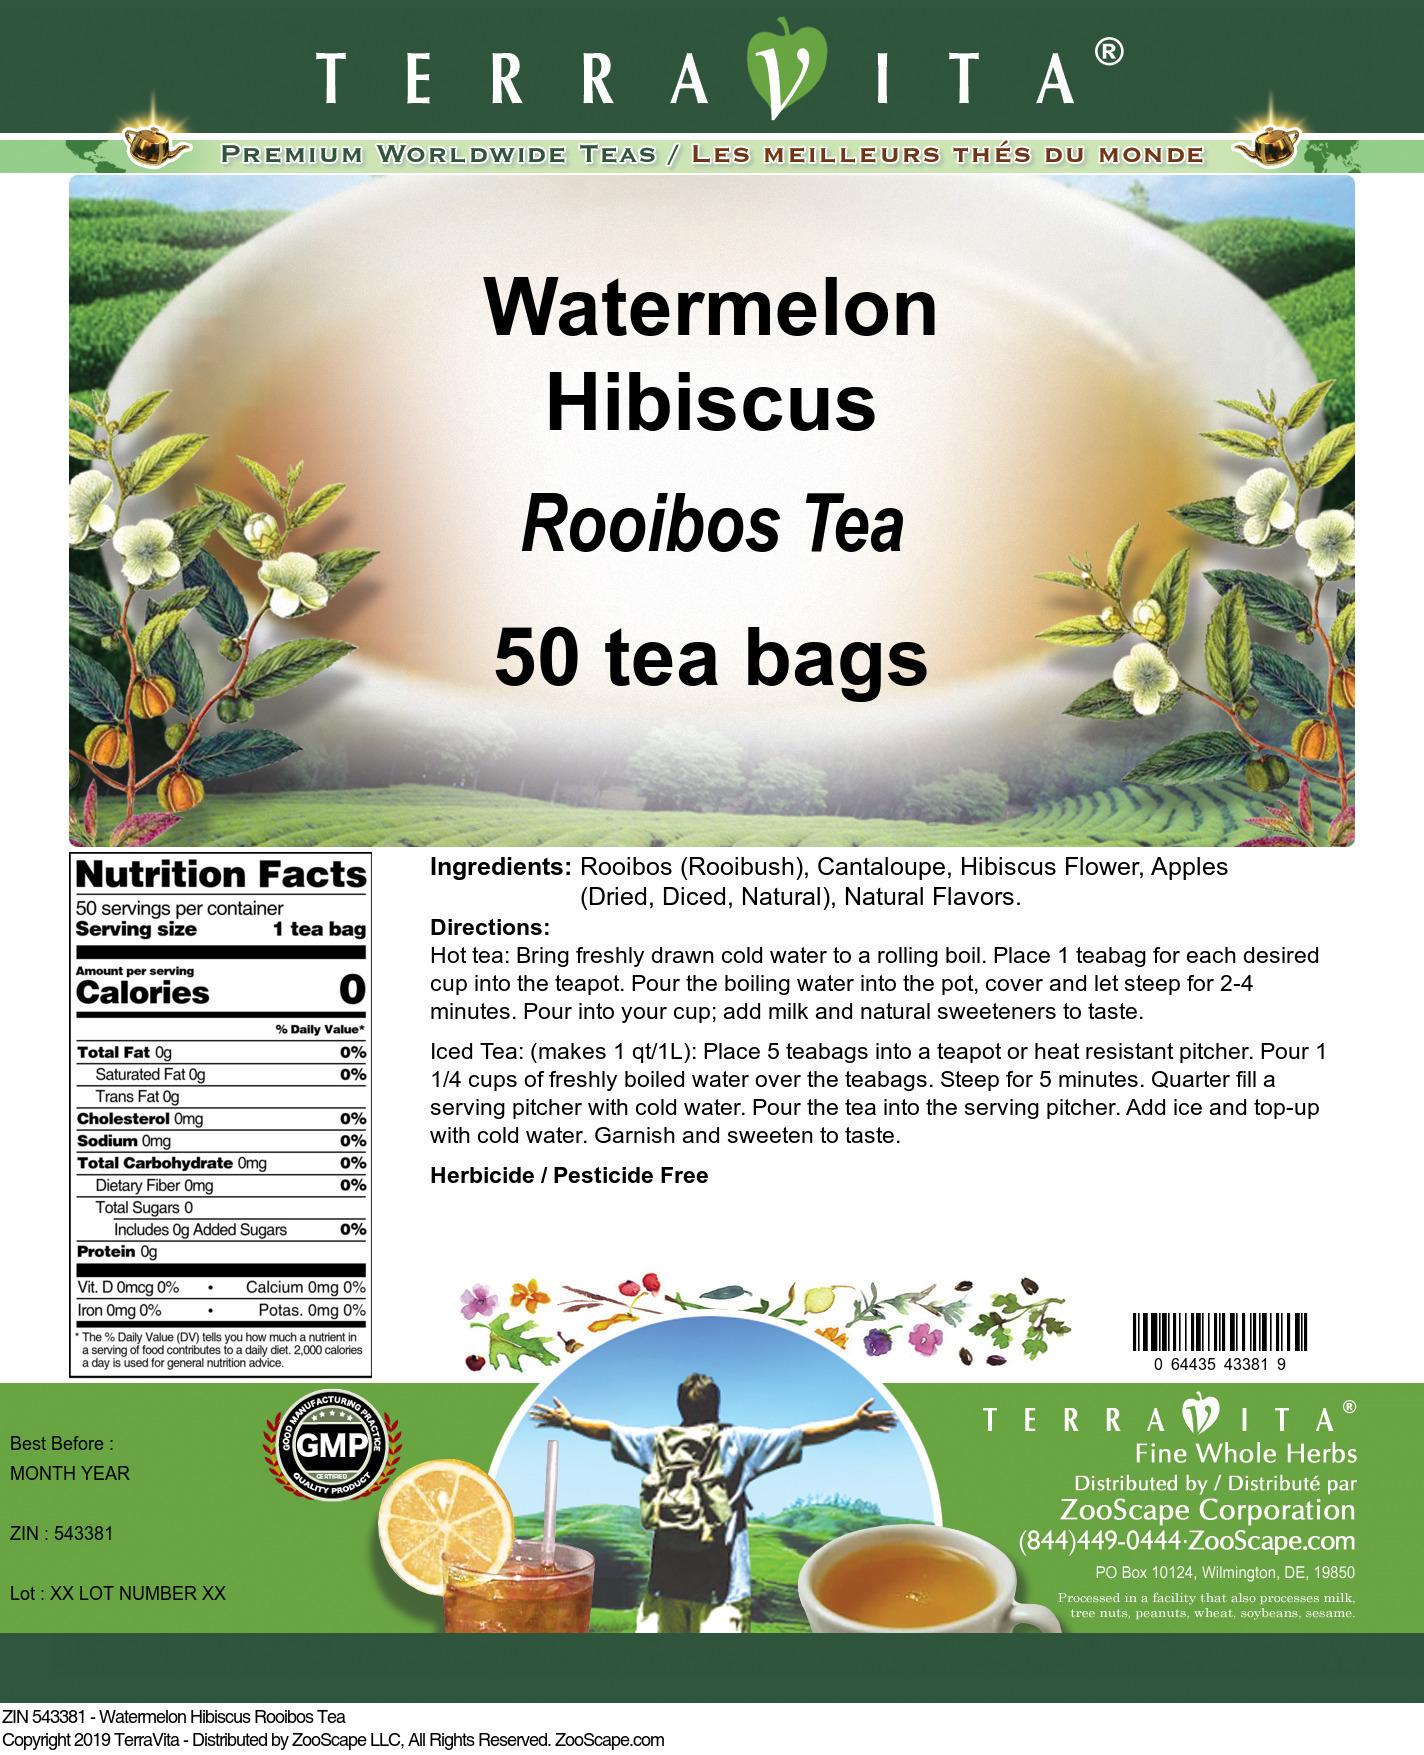 Watermelon Hibiscus Rooibos Tea